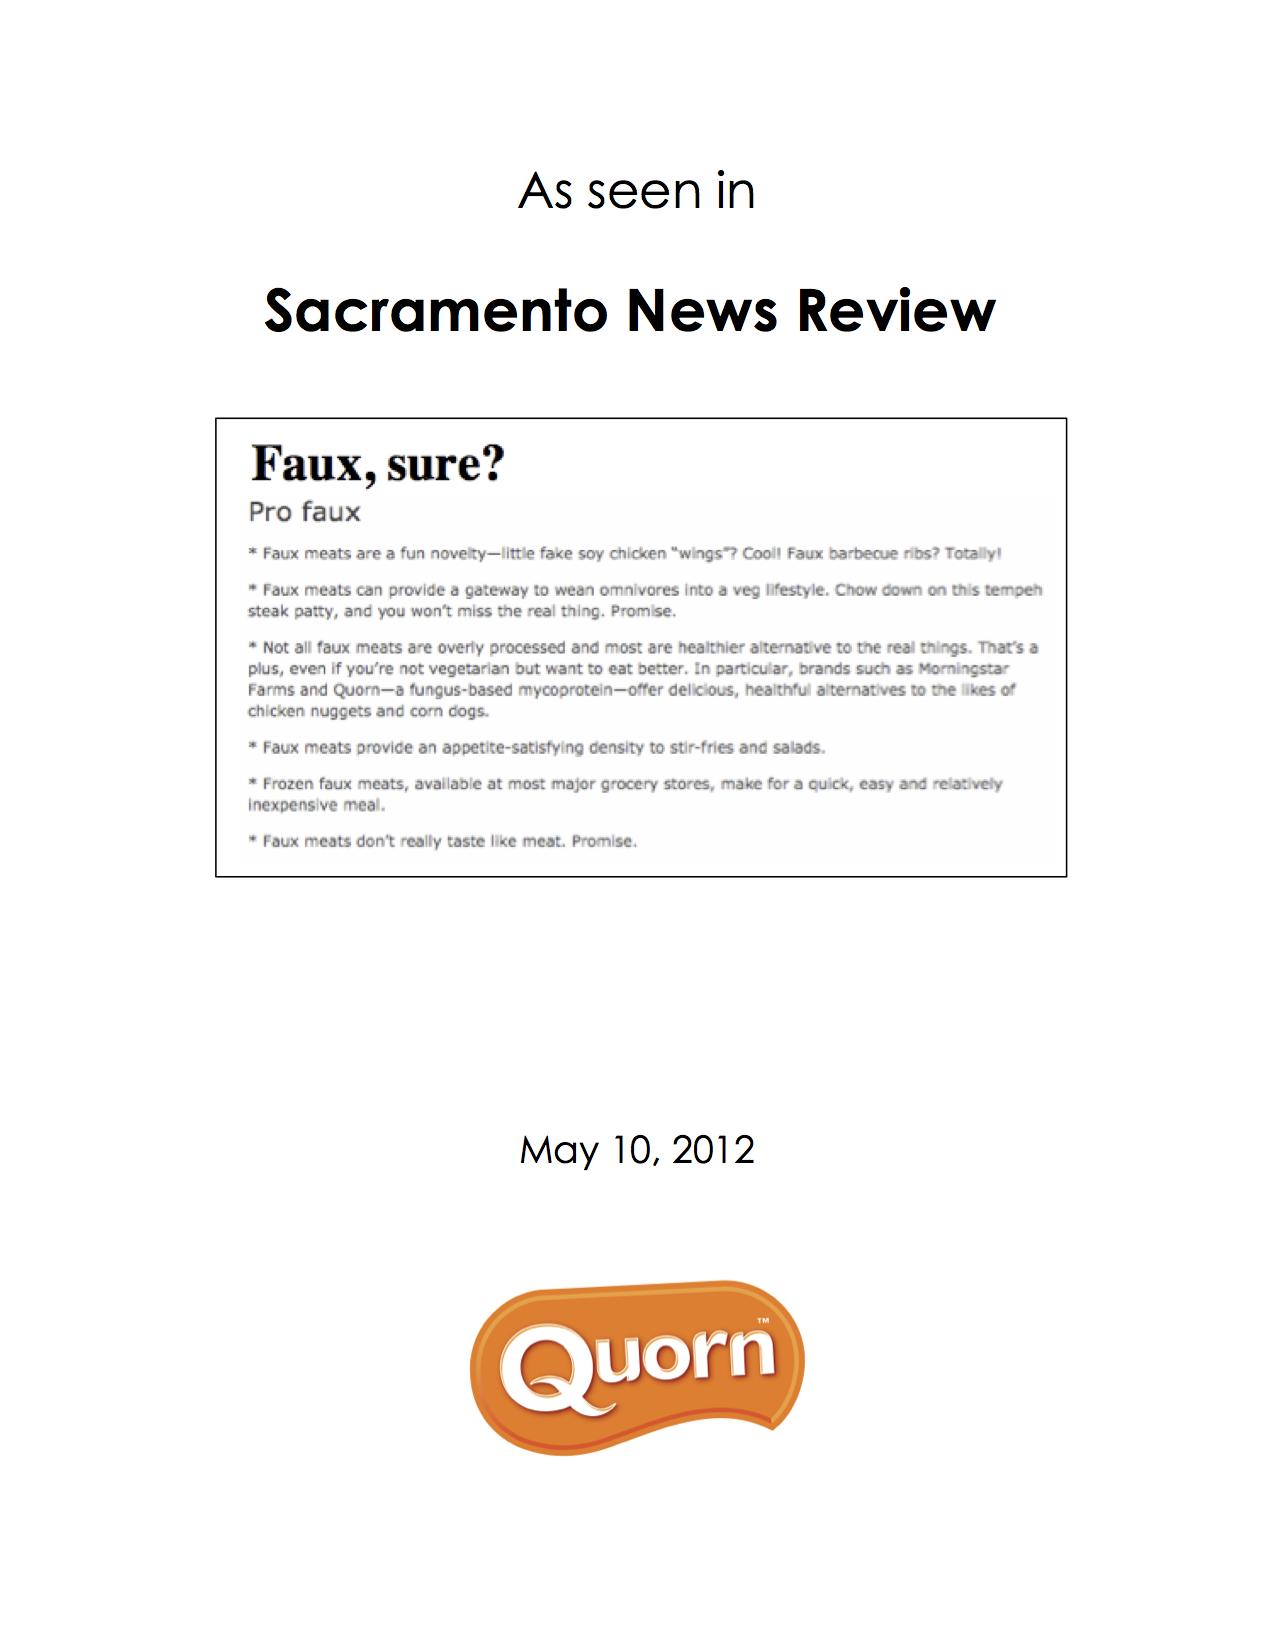 quorncoverage-sacramentonewsreview.jpg